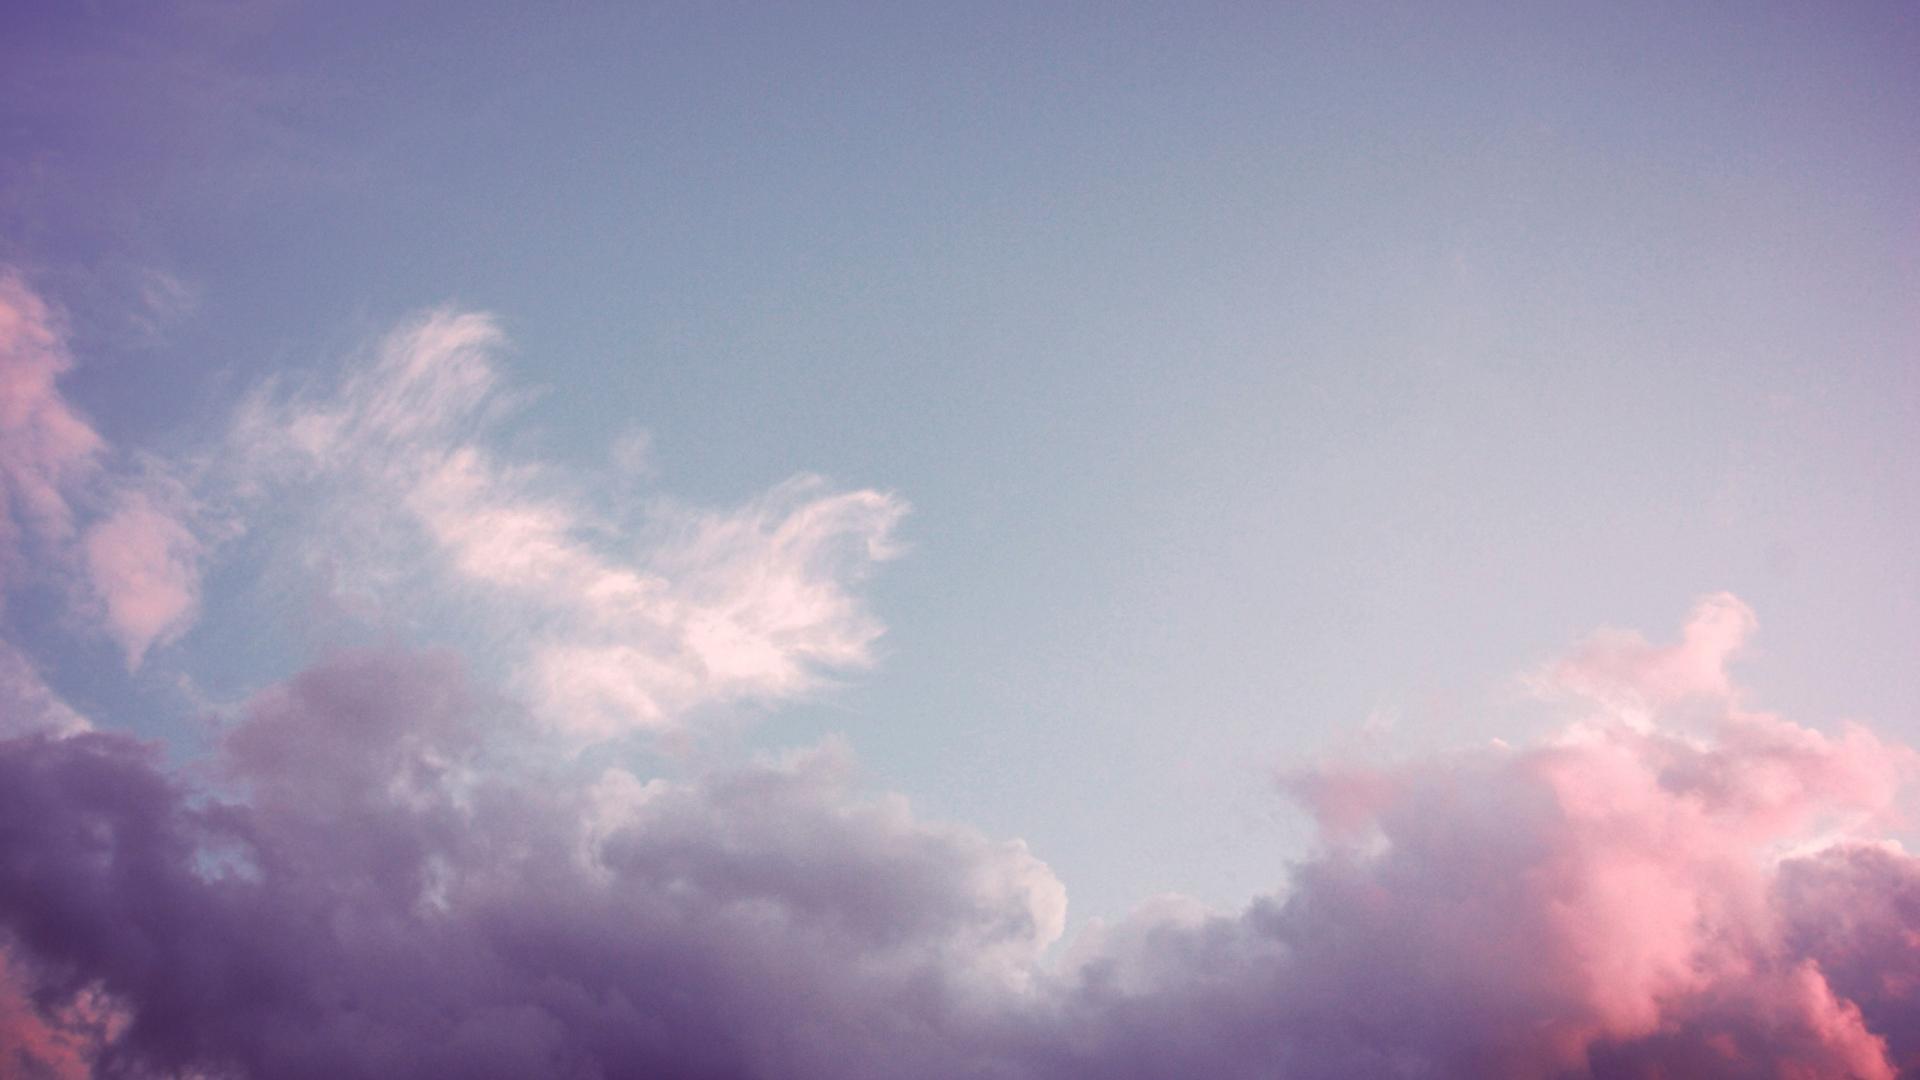 Free Download Download Sky Clouds Wallpaper Hd Wallpaper